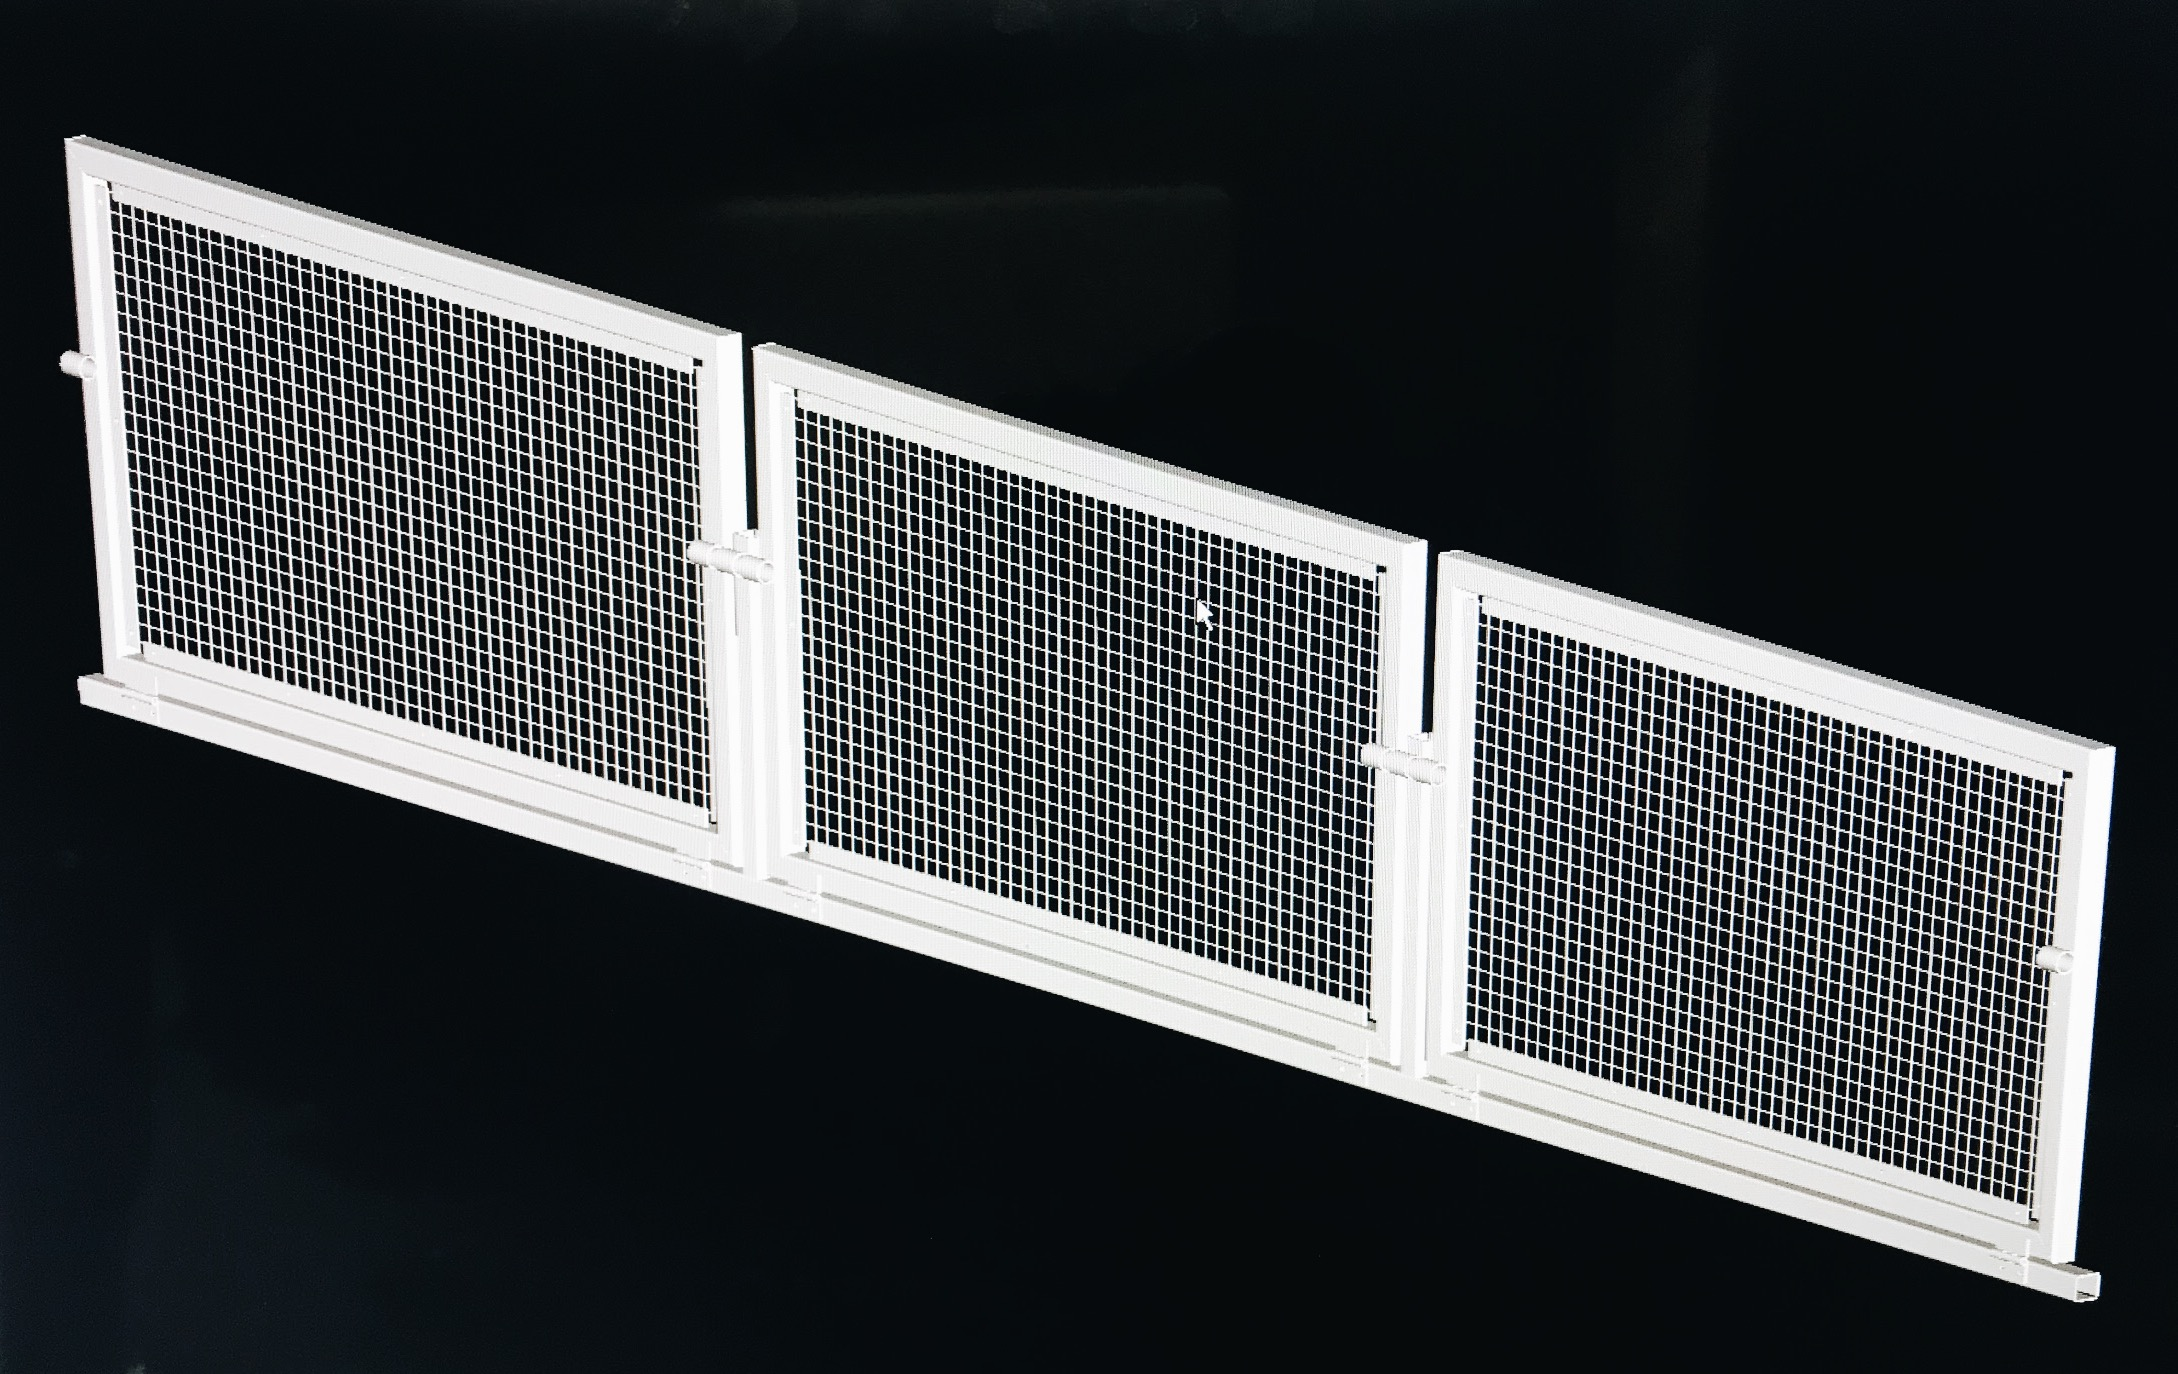 fabrication texas industrial machine & design 5.jpg